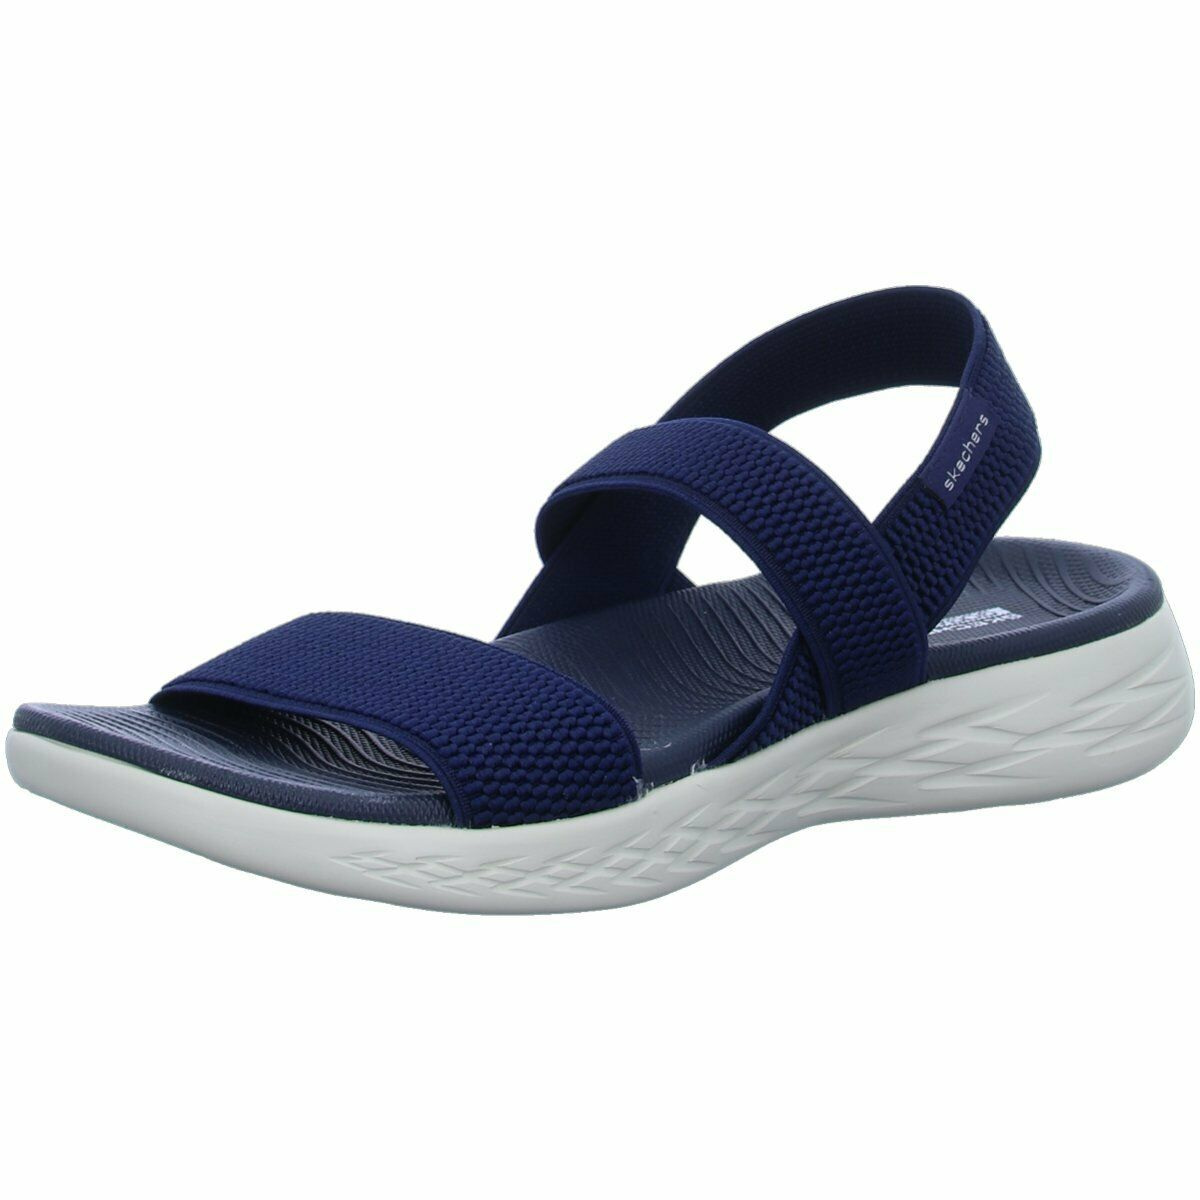 Skechers Damen Sandaletten ON-THE-GO 600 - FLAWLESS 15312 NVY blau 669020